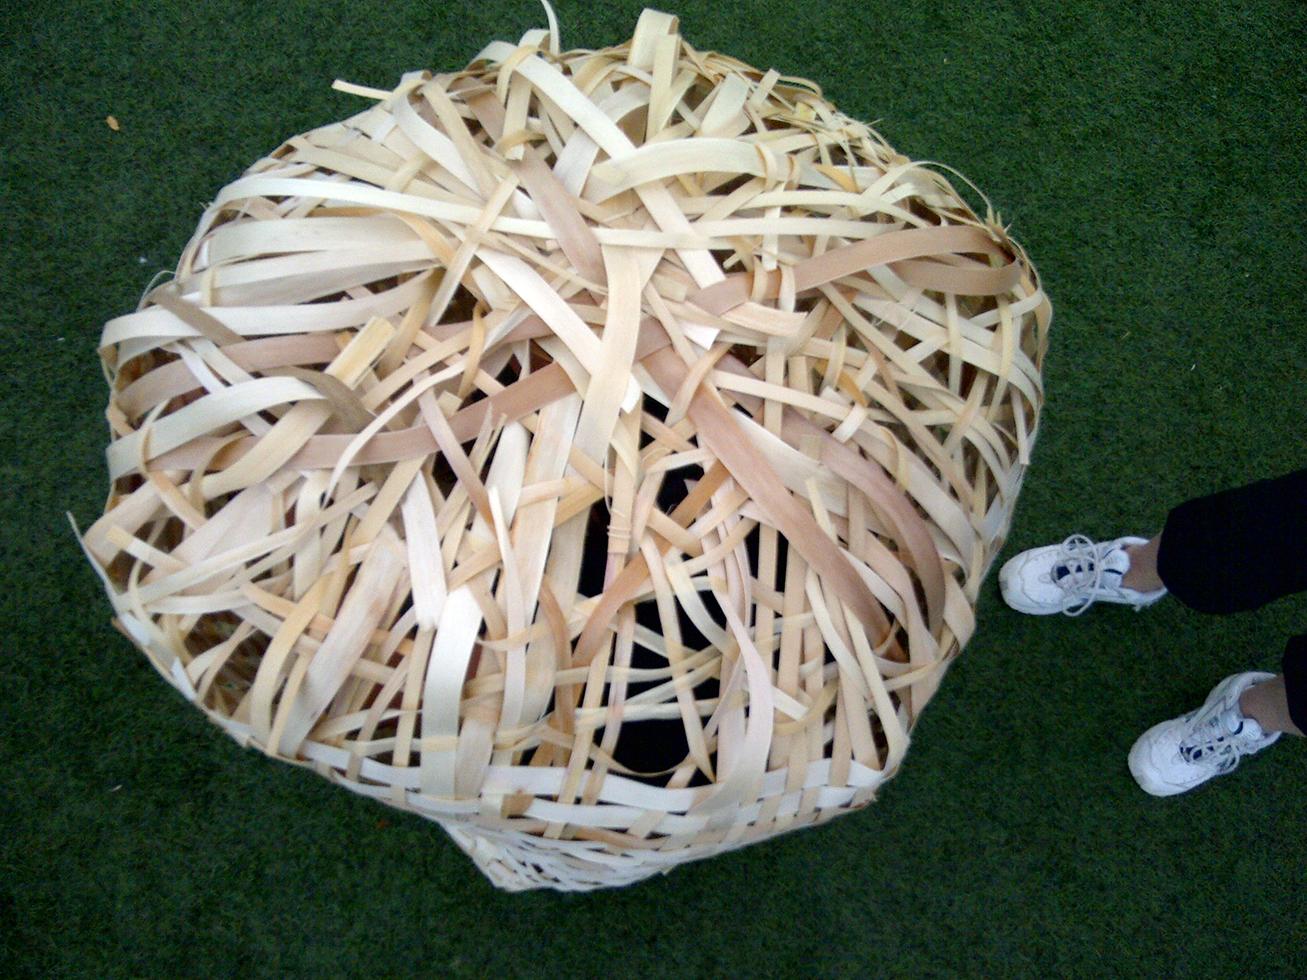 Basket Weaving Toronto : Basket weaving cultural cocoon ursula